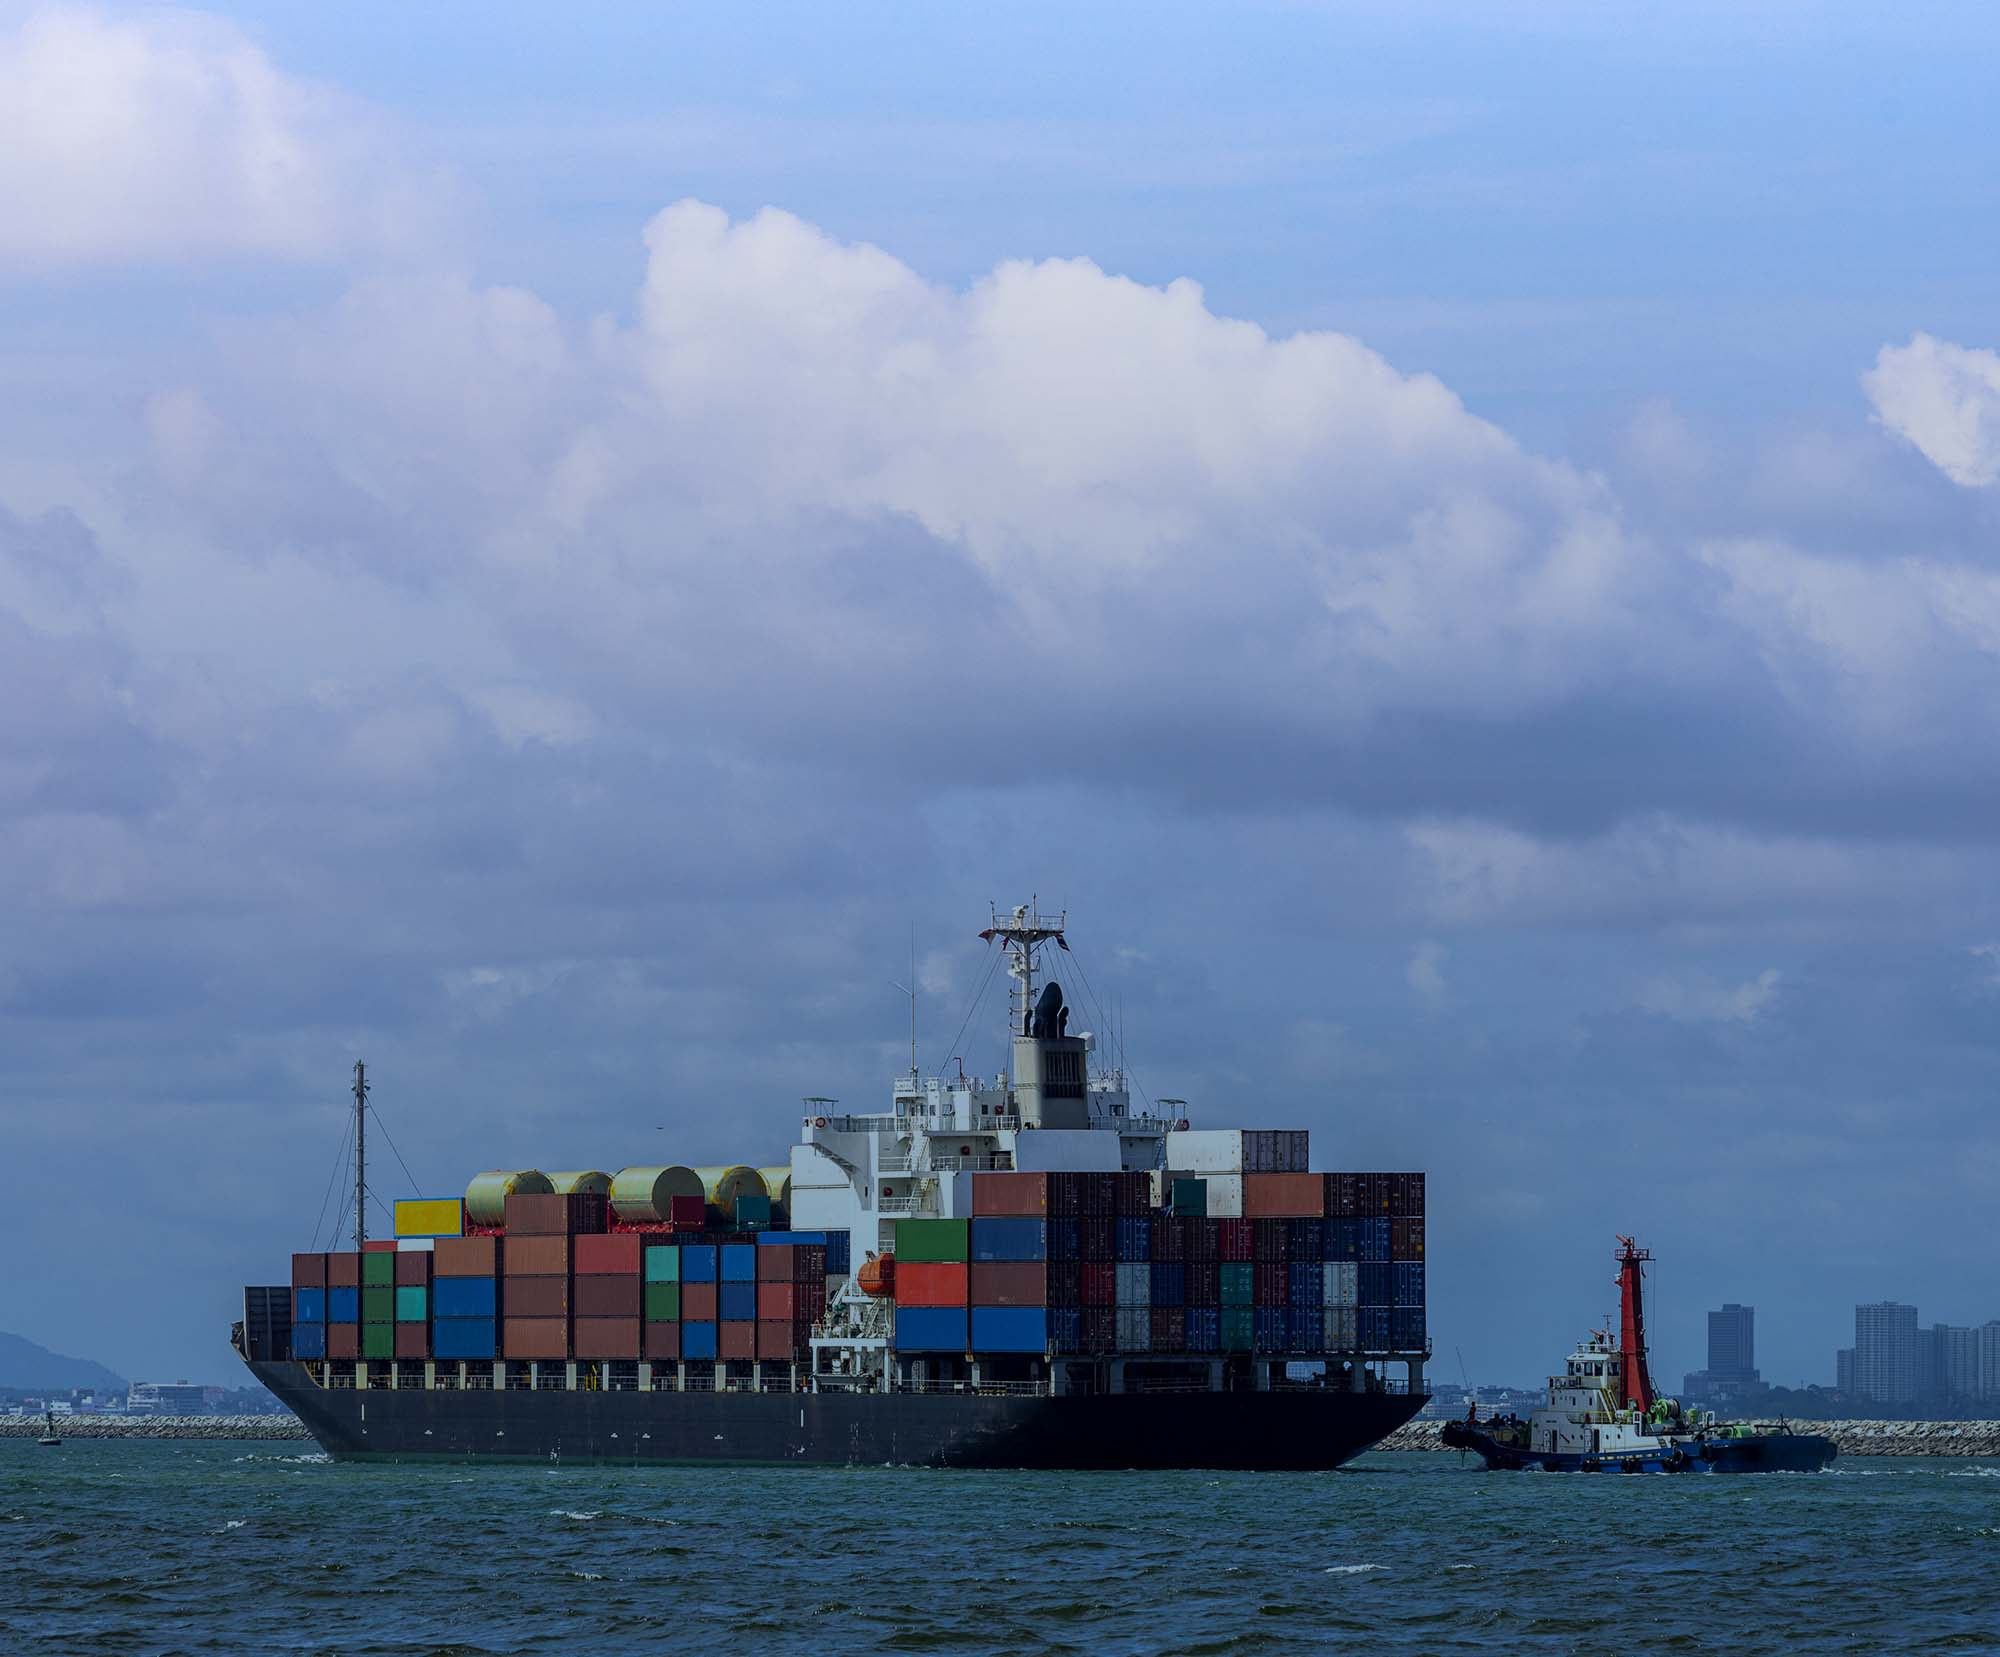 Port Collaborative Decision Making